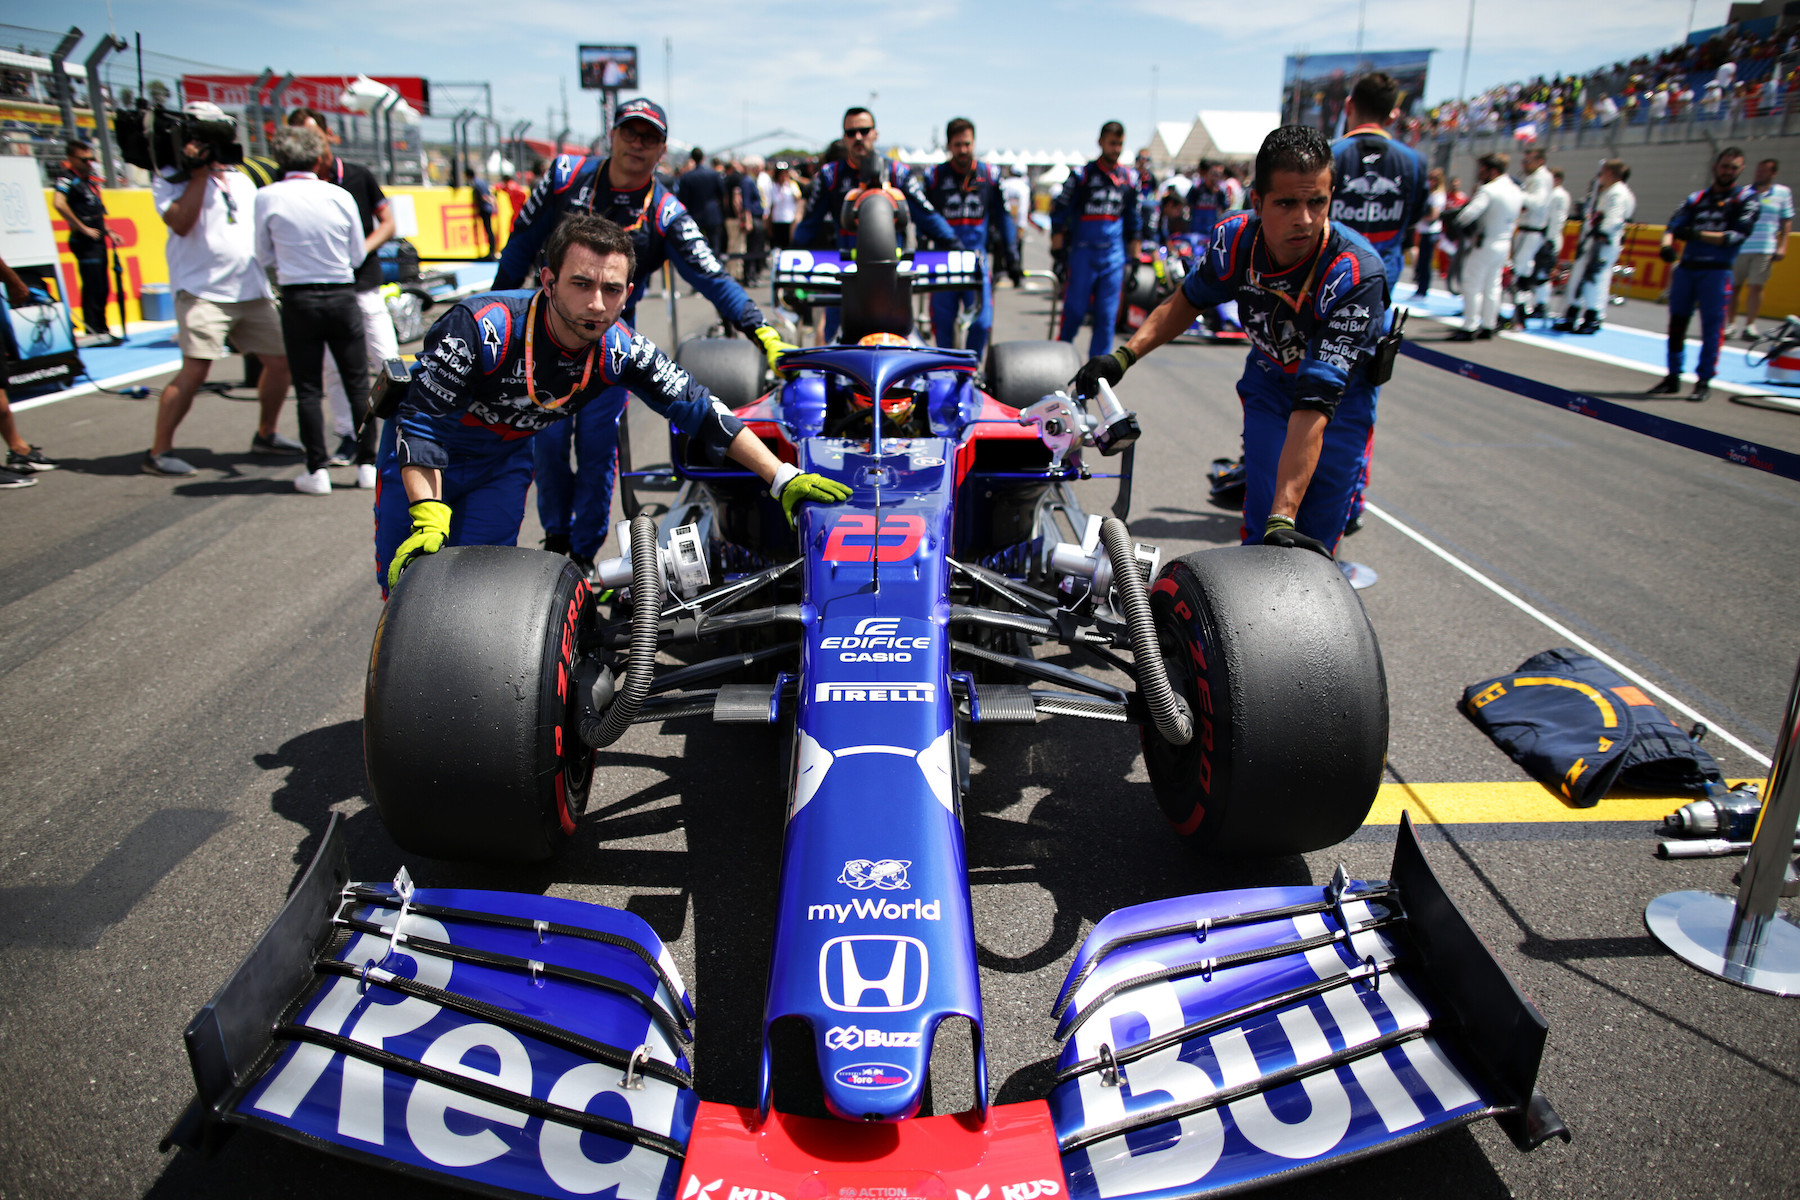 3 2019 French GP Sunday 30.jpg